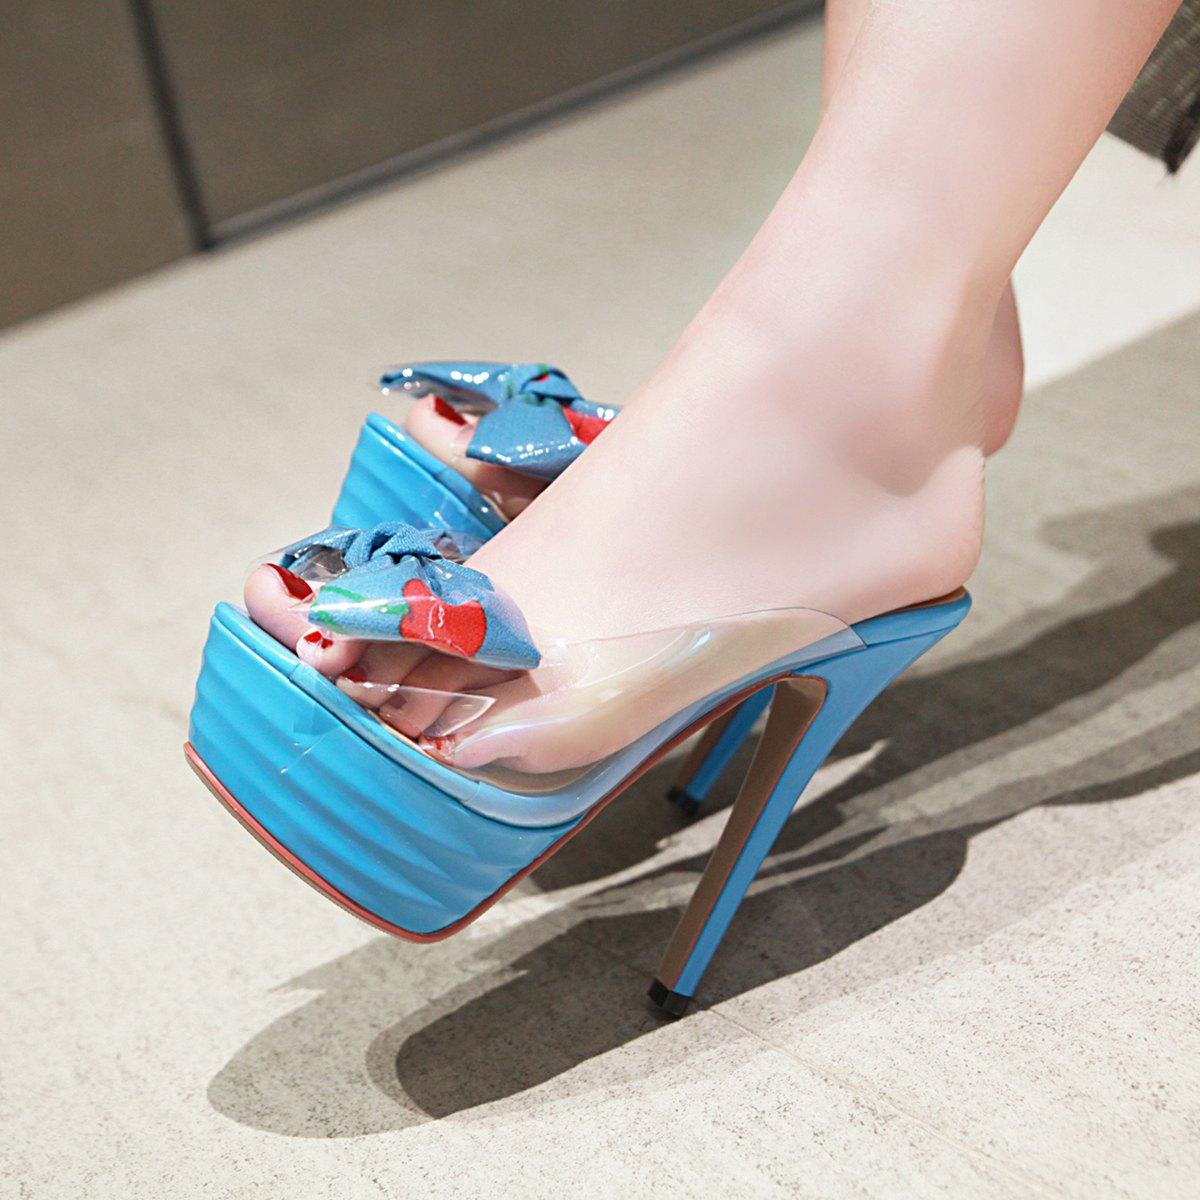 8f629fd8793b US$ 33 - Arden Furtado summer 2019 fashion women's shoes stilettos heels  peep toe slippers platform mules PVC bowknot butterfly knot sandals size 32  33 ...